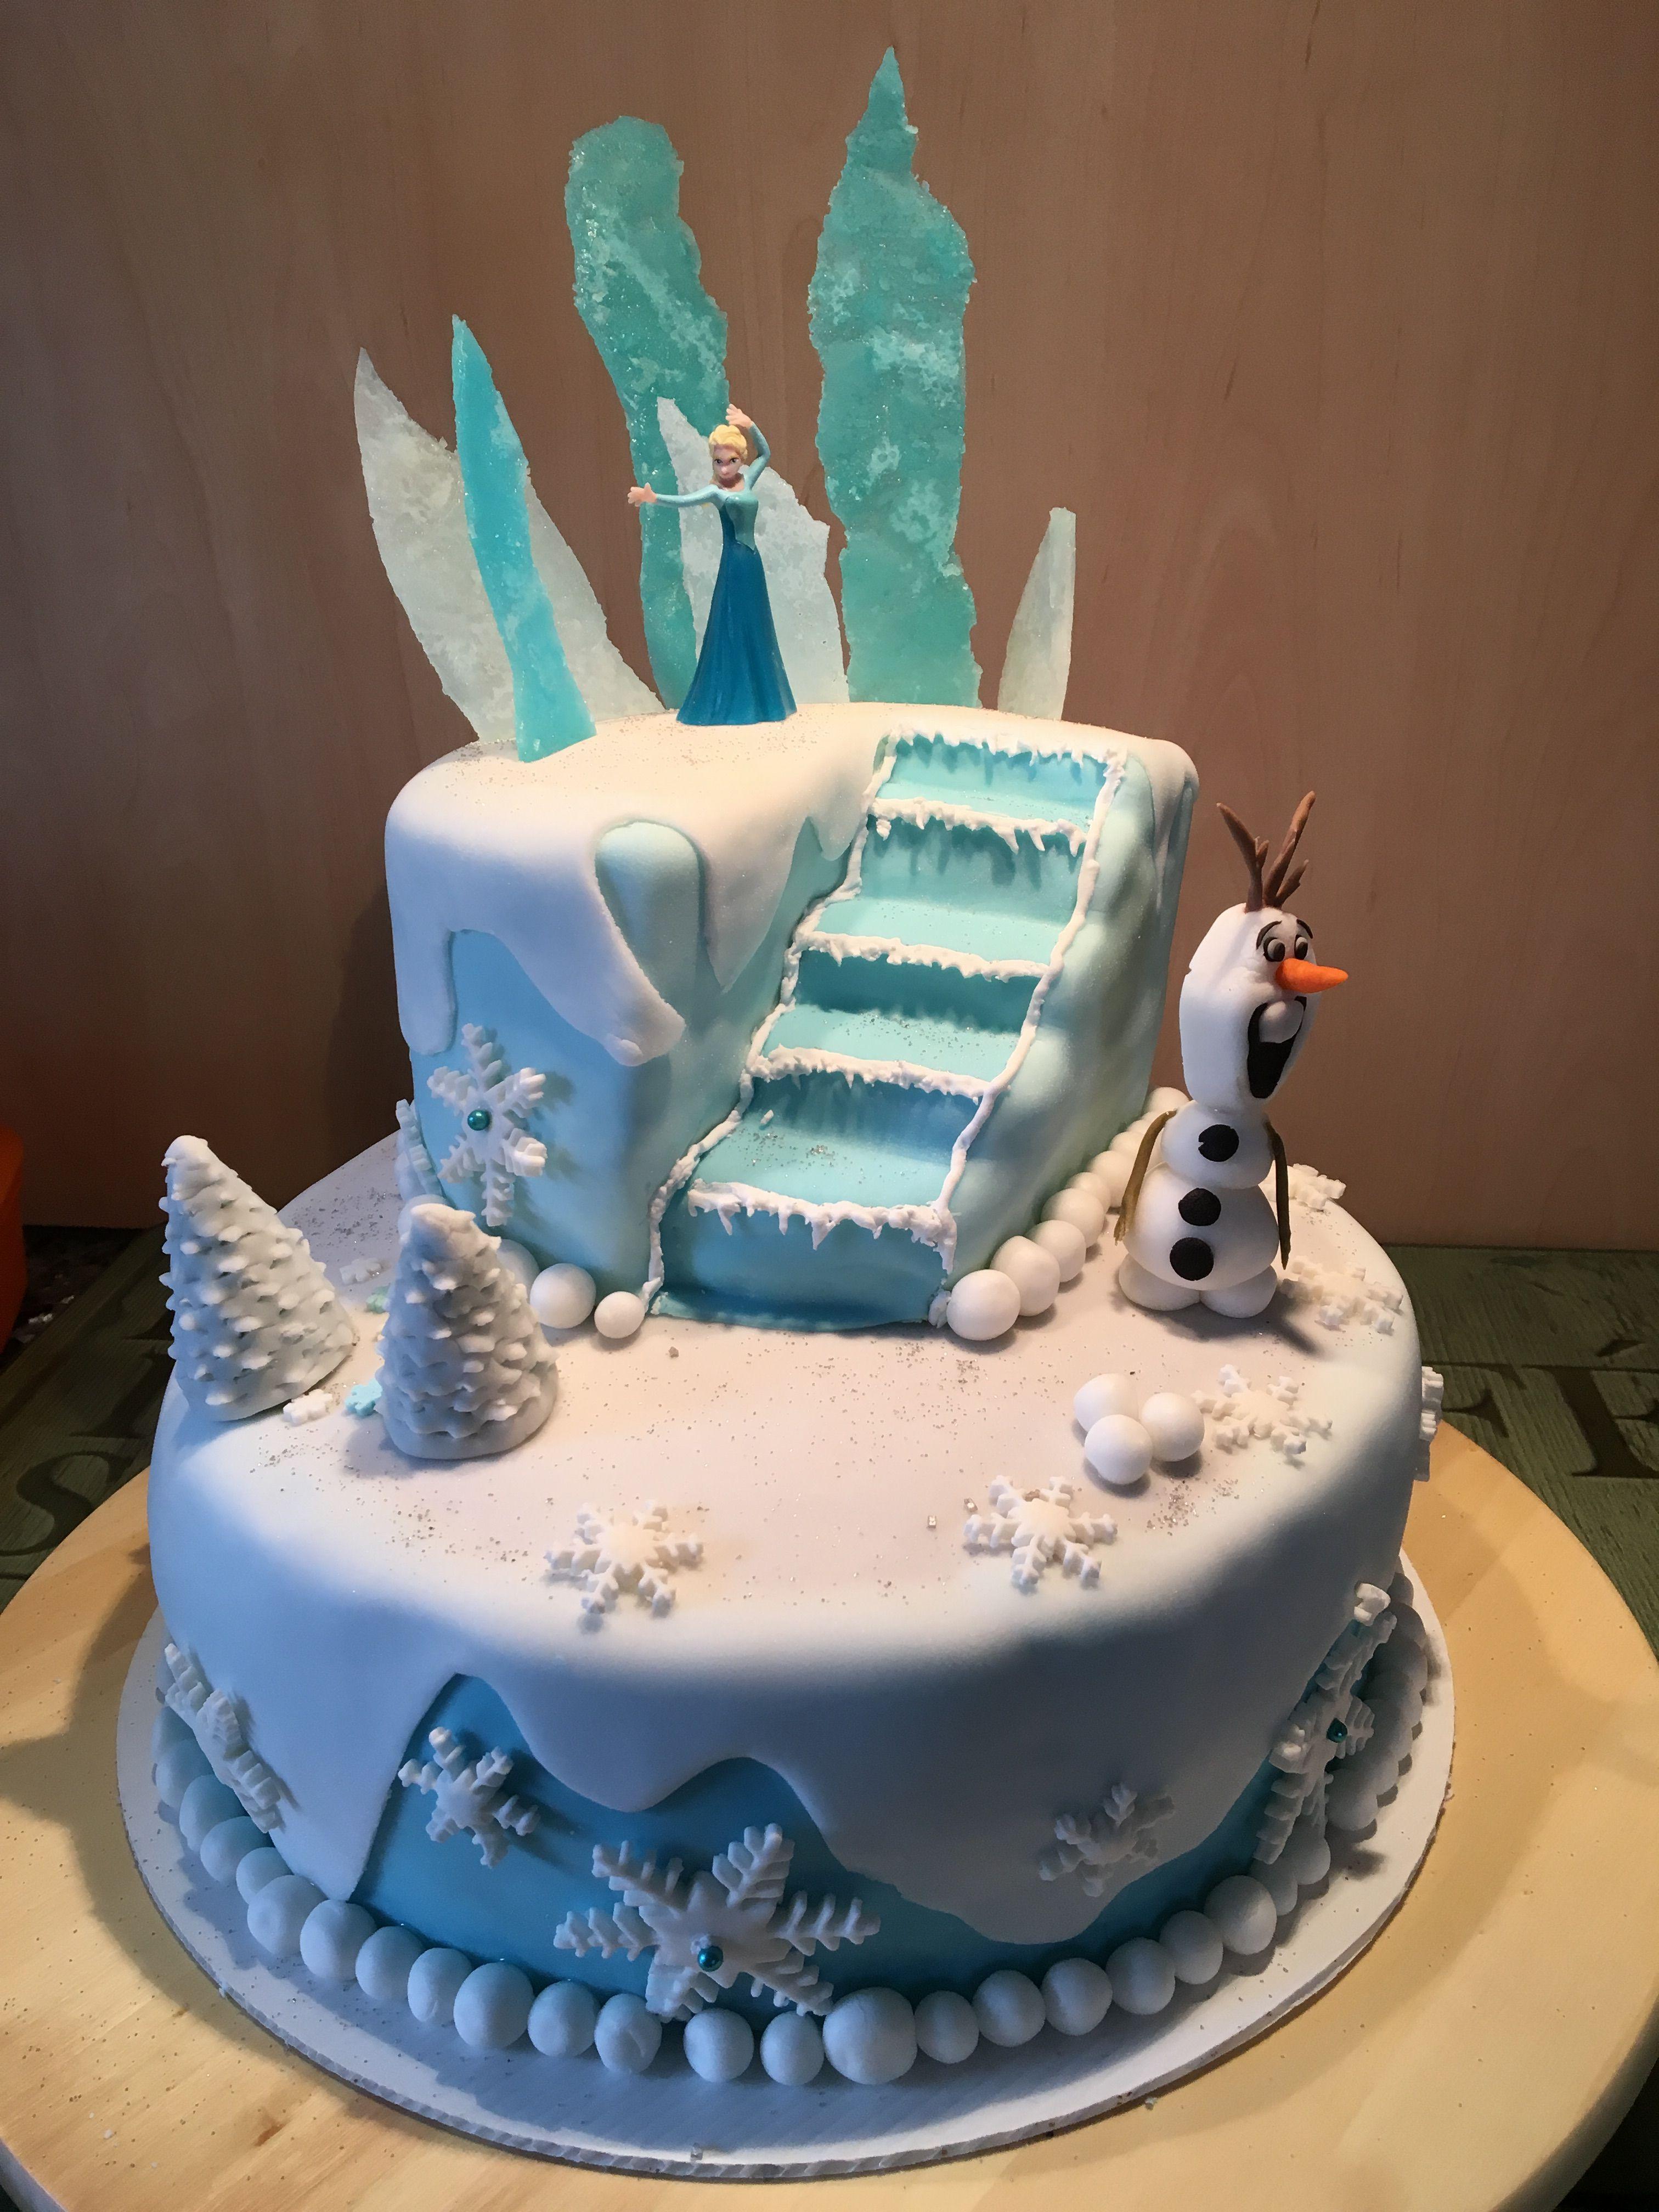 Elsa cake cake decorating for kids elsa cakes kids cake